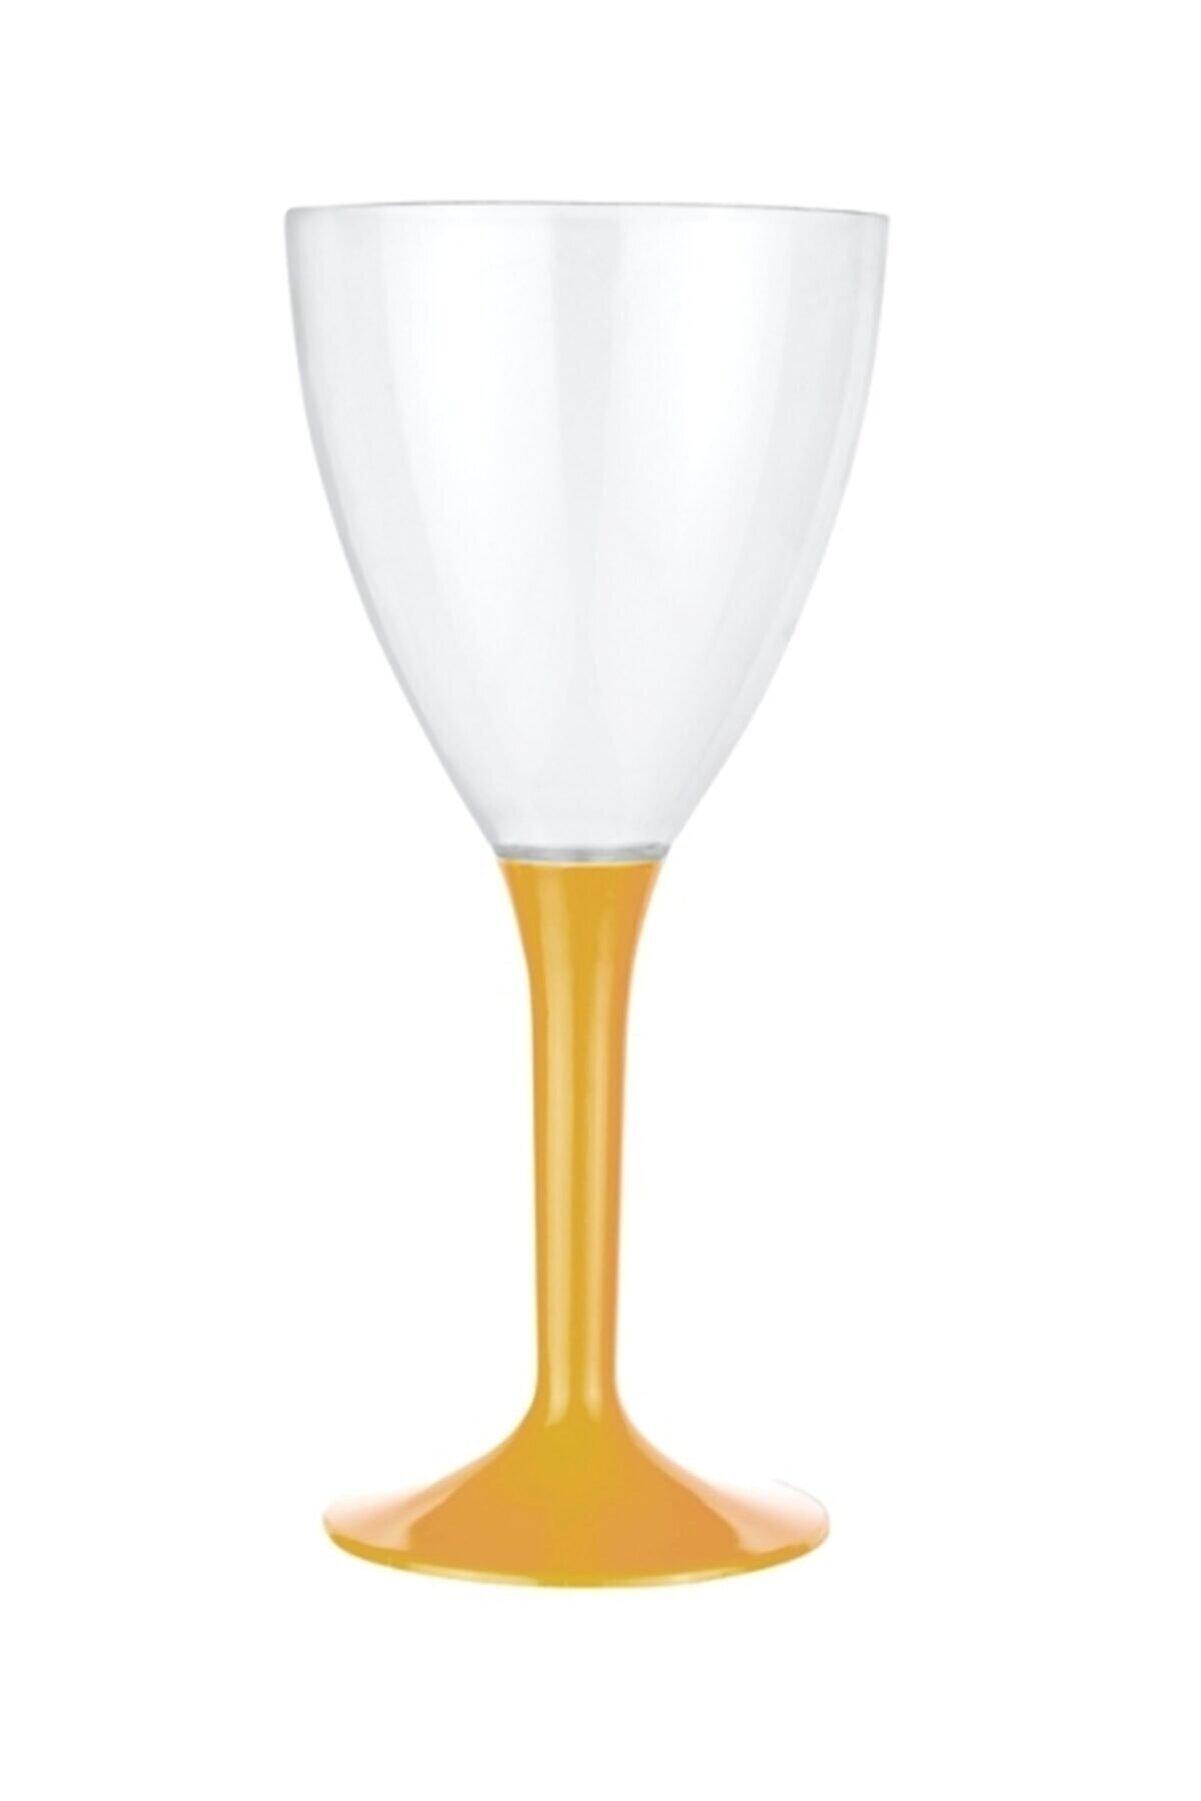 Kristal Gold Renk Plastik Şarap Kadehi 10 Adet